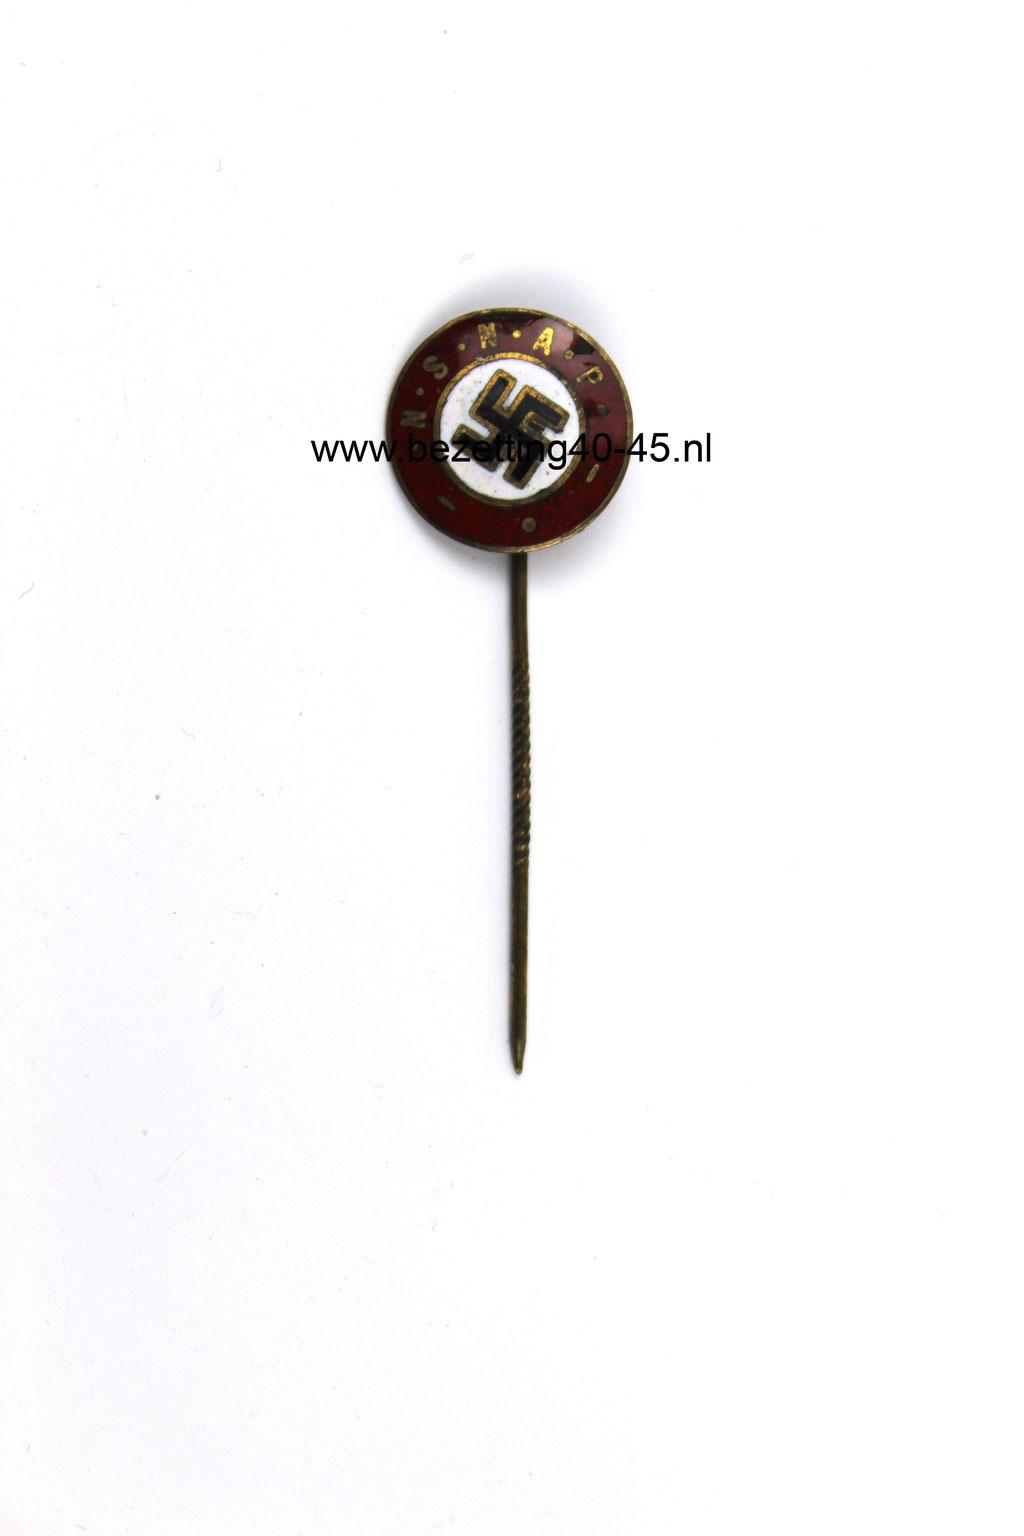 Lidmaatschap speld NSNAP  (Van Rappard) - Dutch NSNAP Badge Pin Medal.